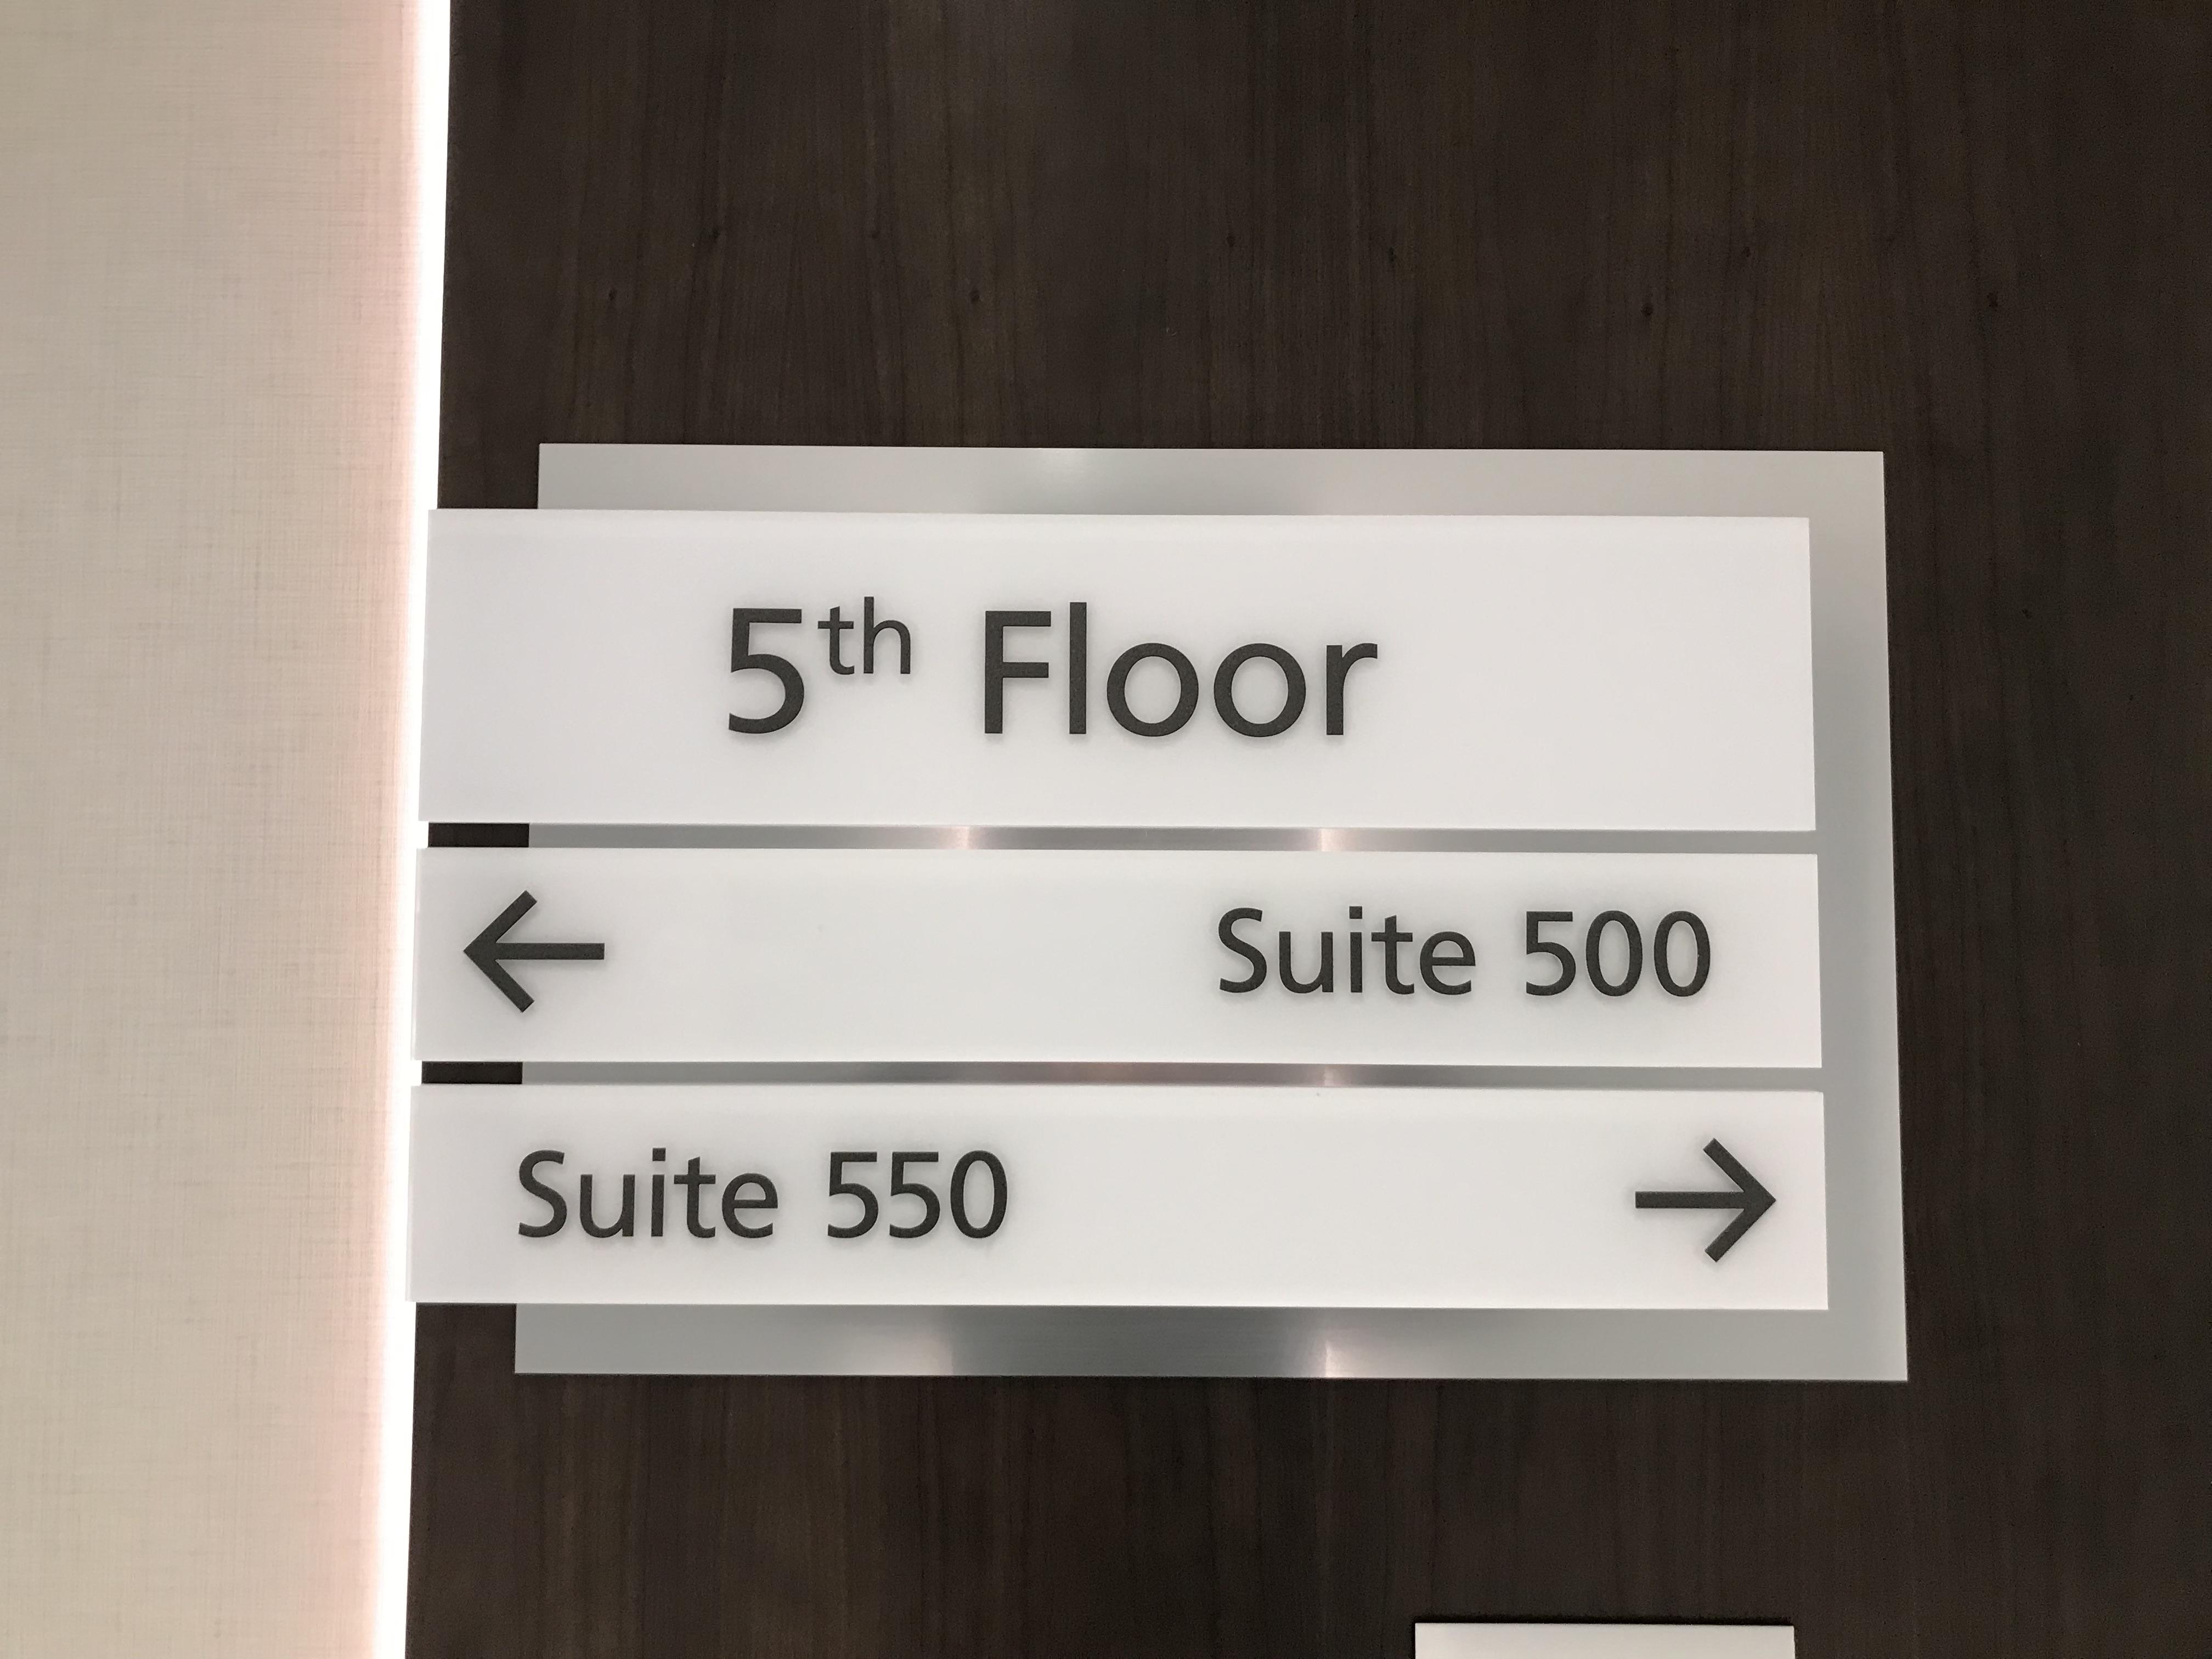 Hallway Wayfinding Sign